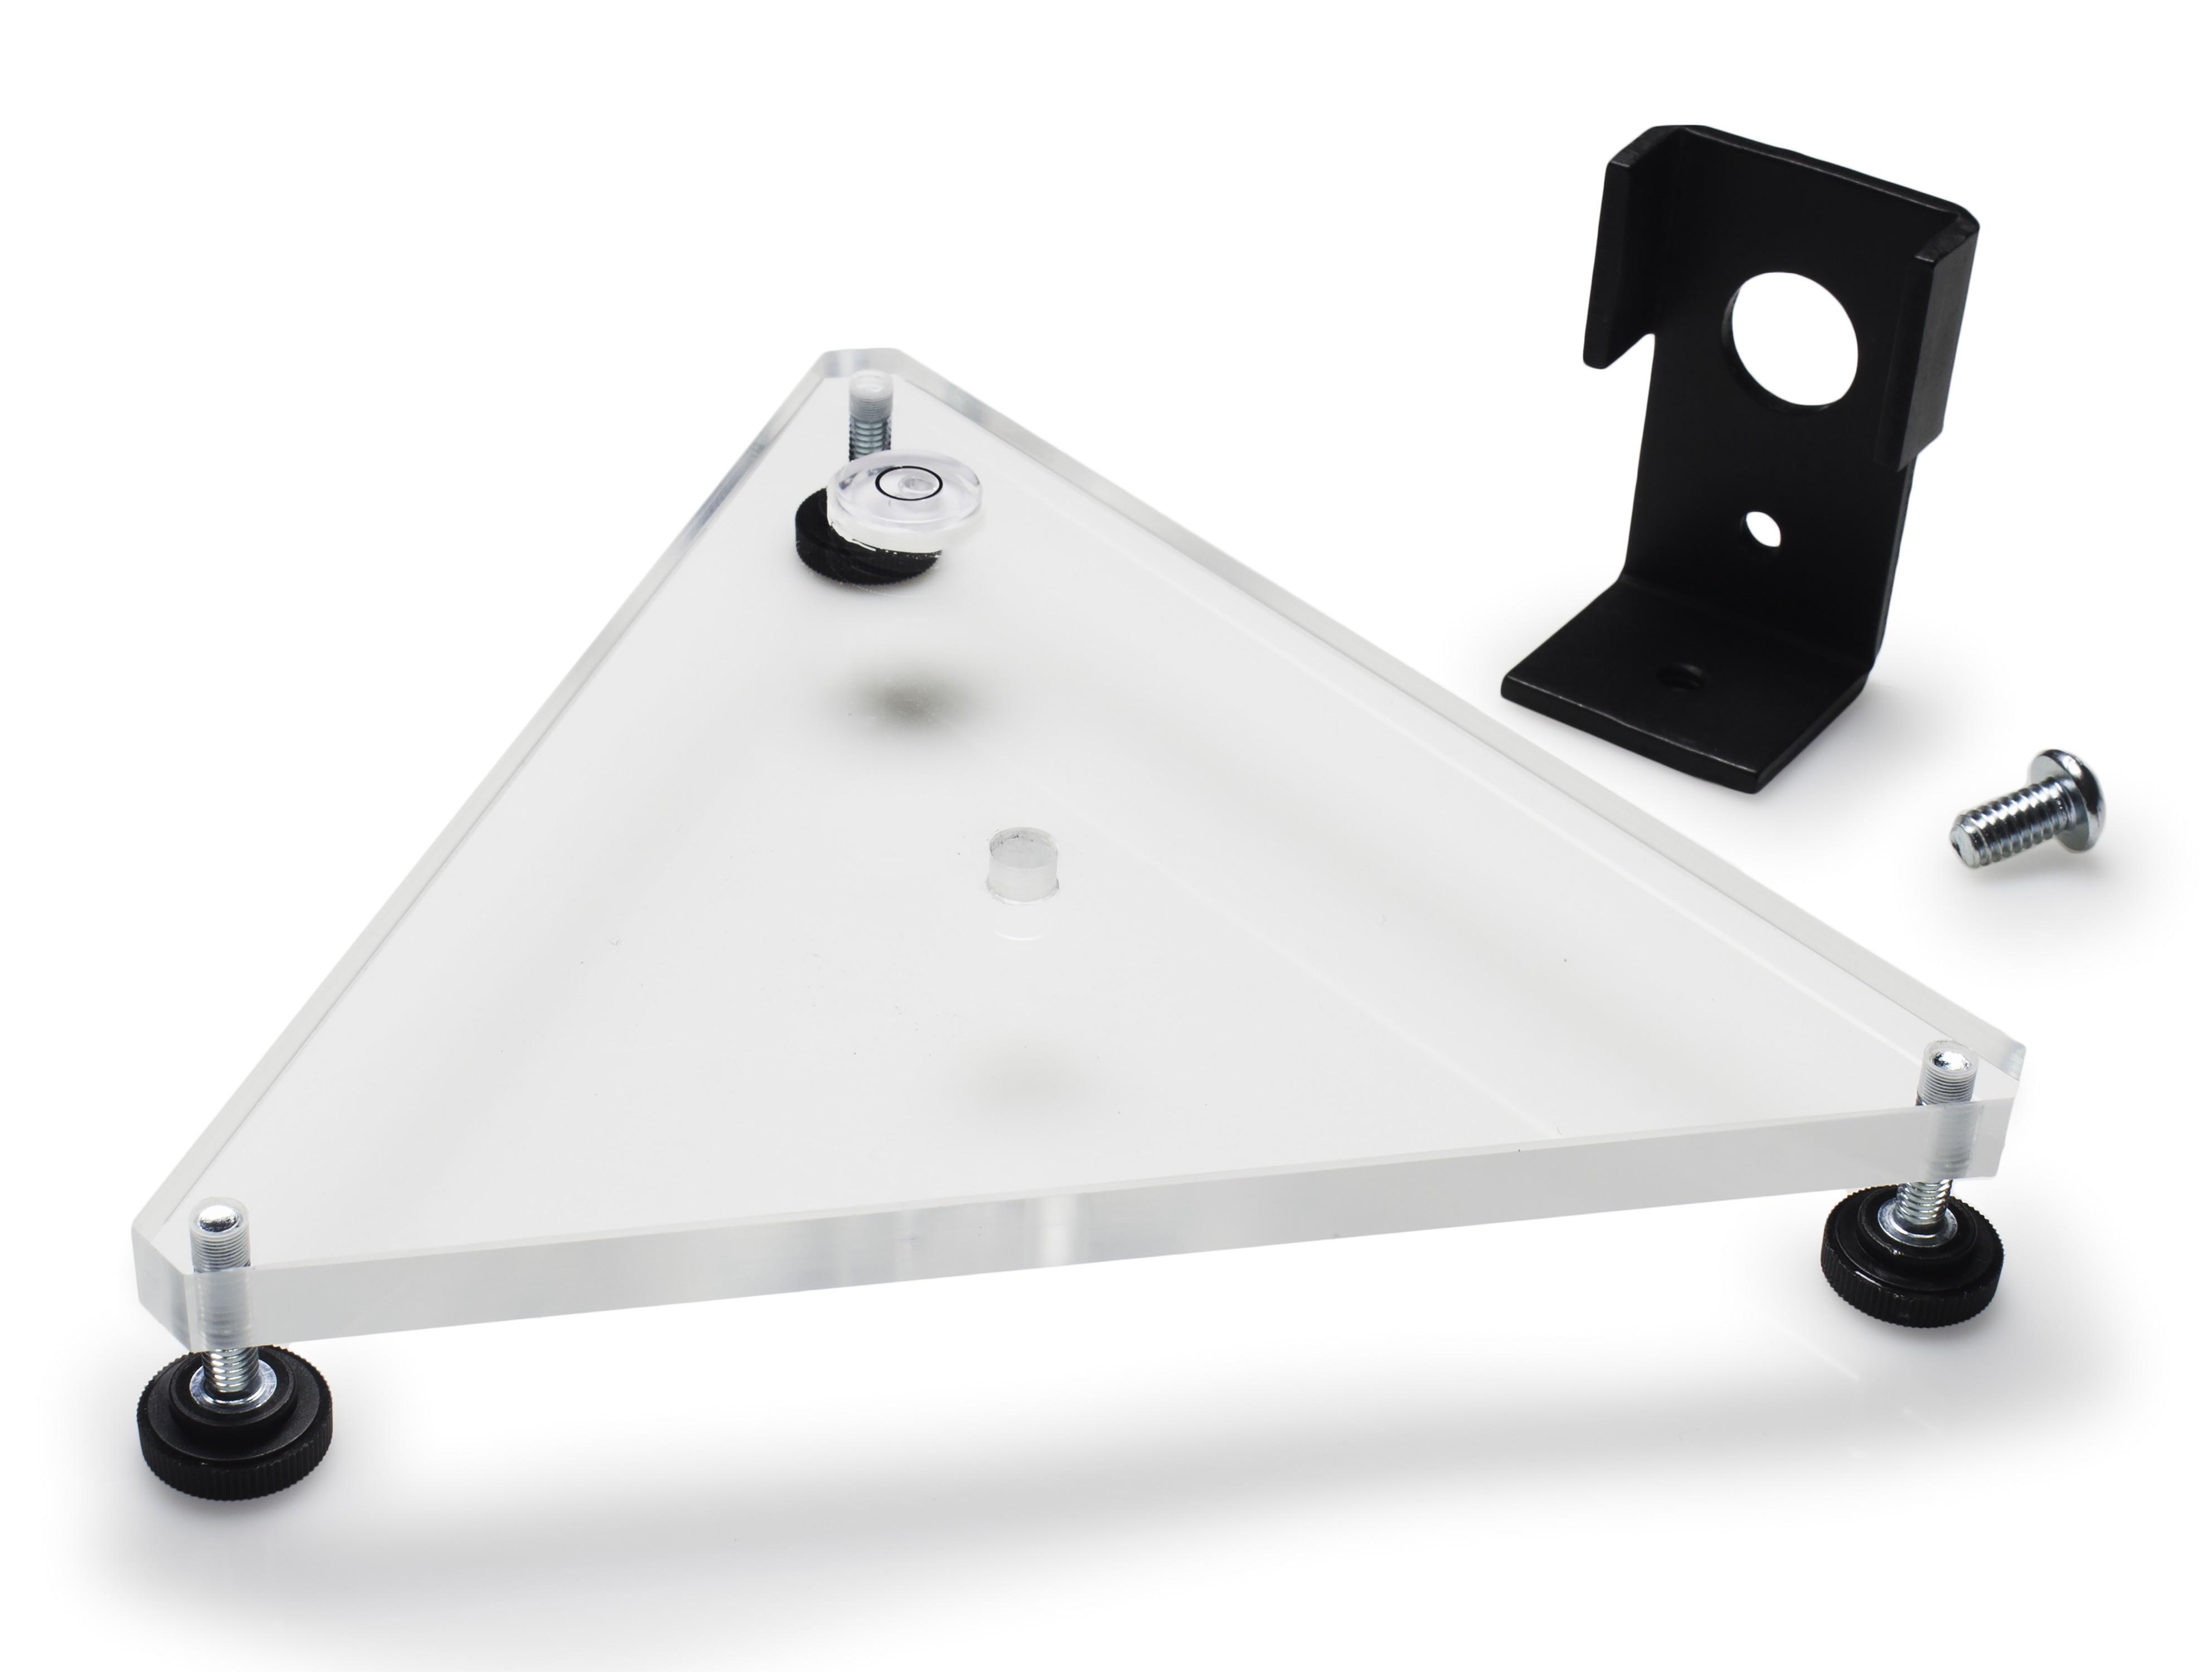 SP Bel-Art Leveling Base Kit for Mounted Flowmeters